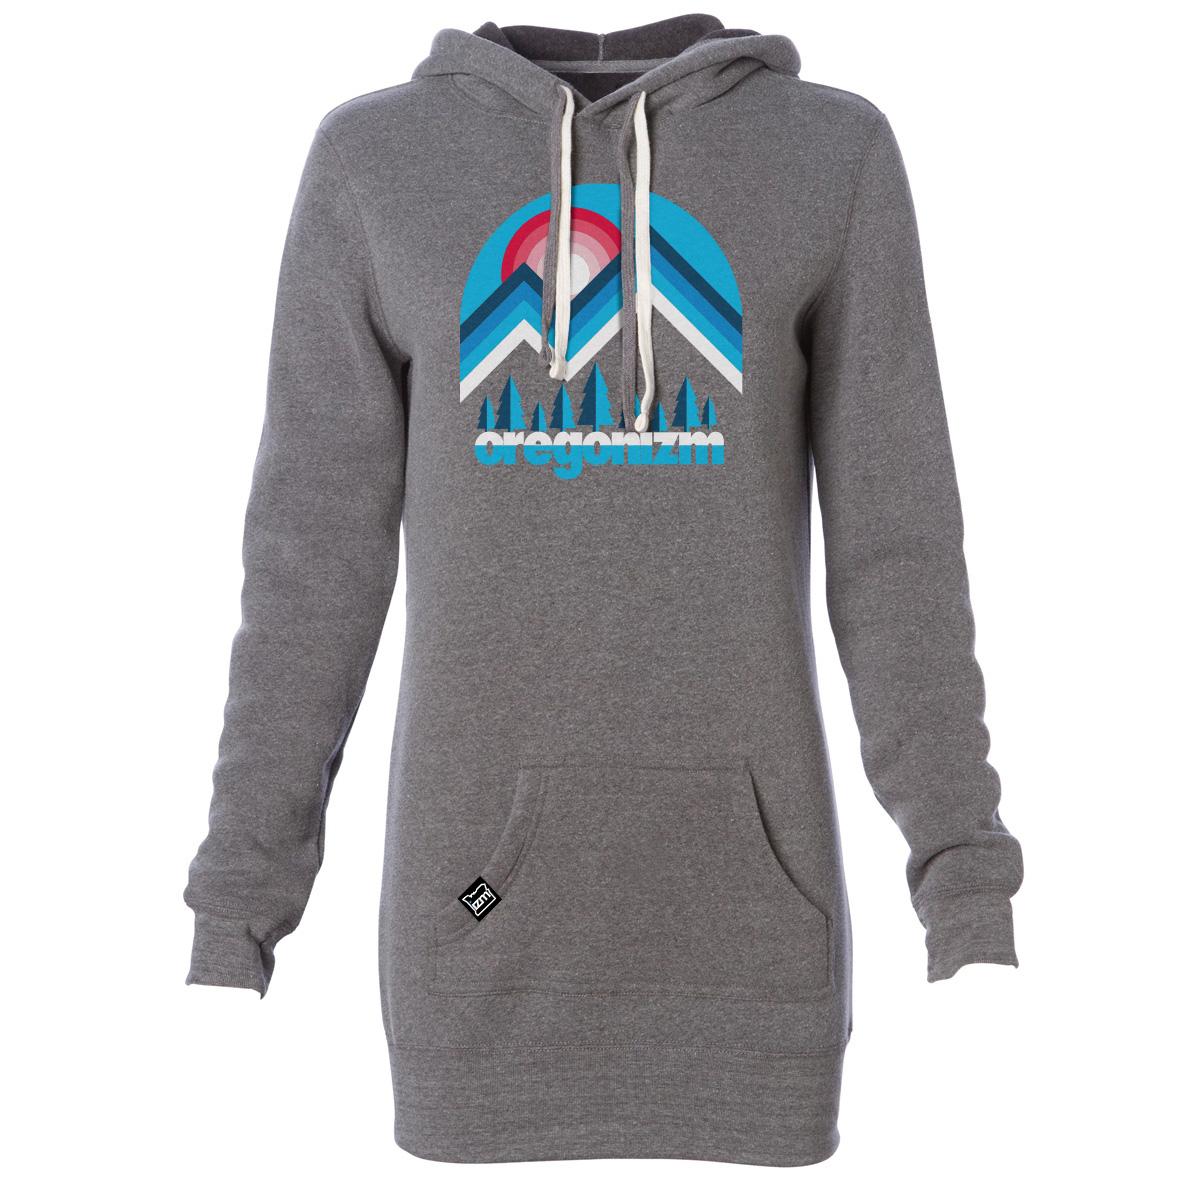 izm-productimage-dresshoodie-mountainscape-gray